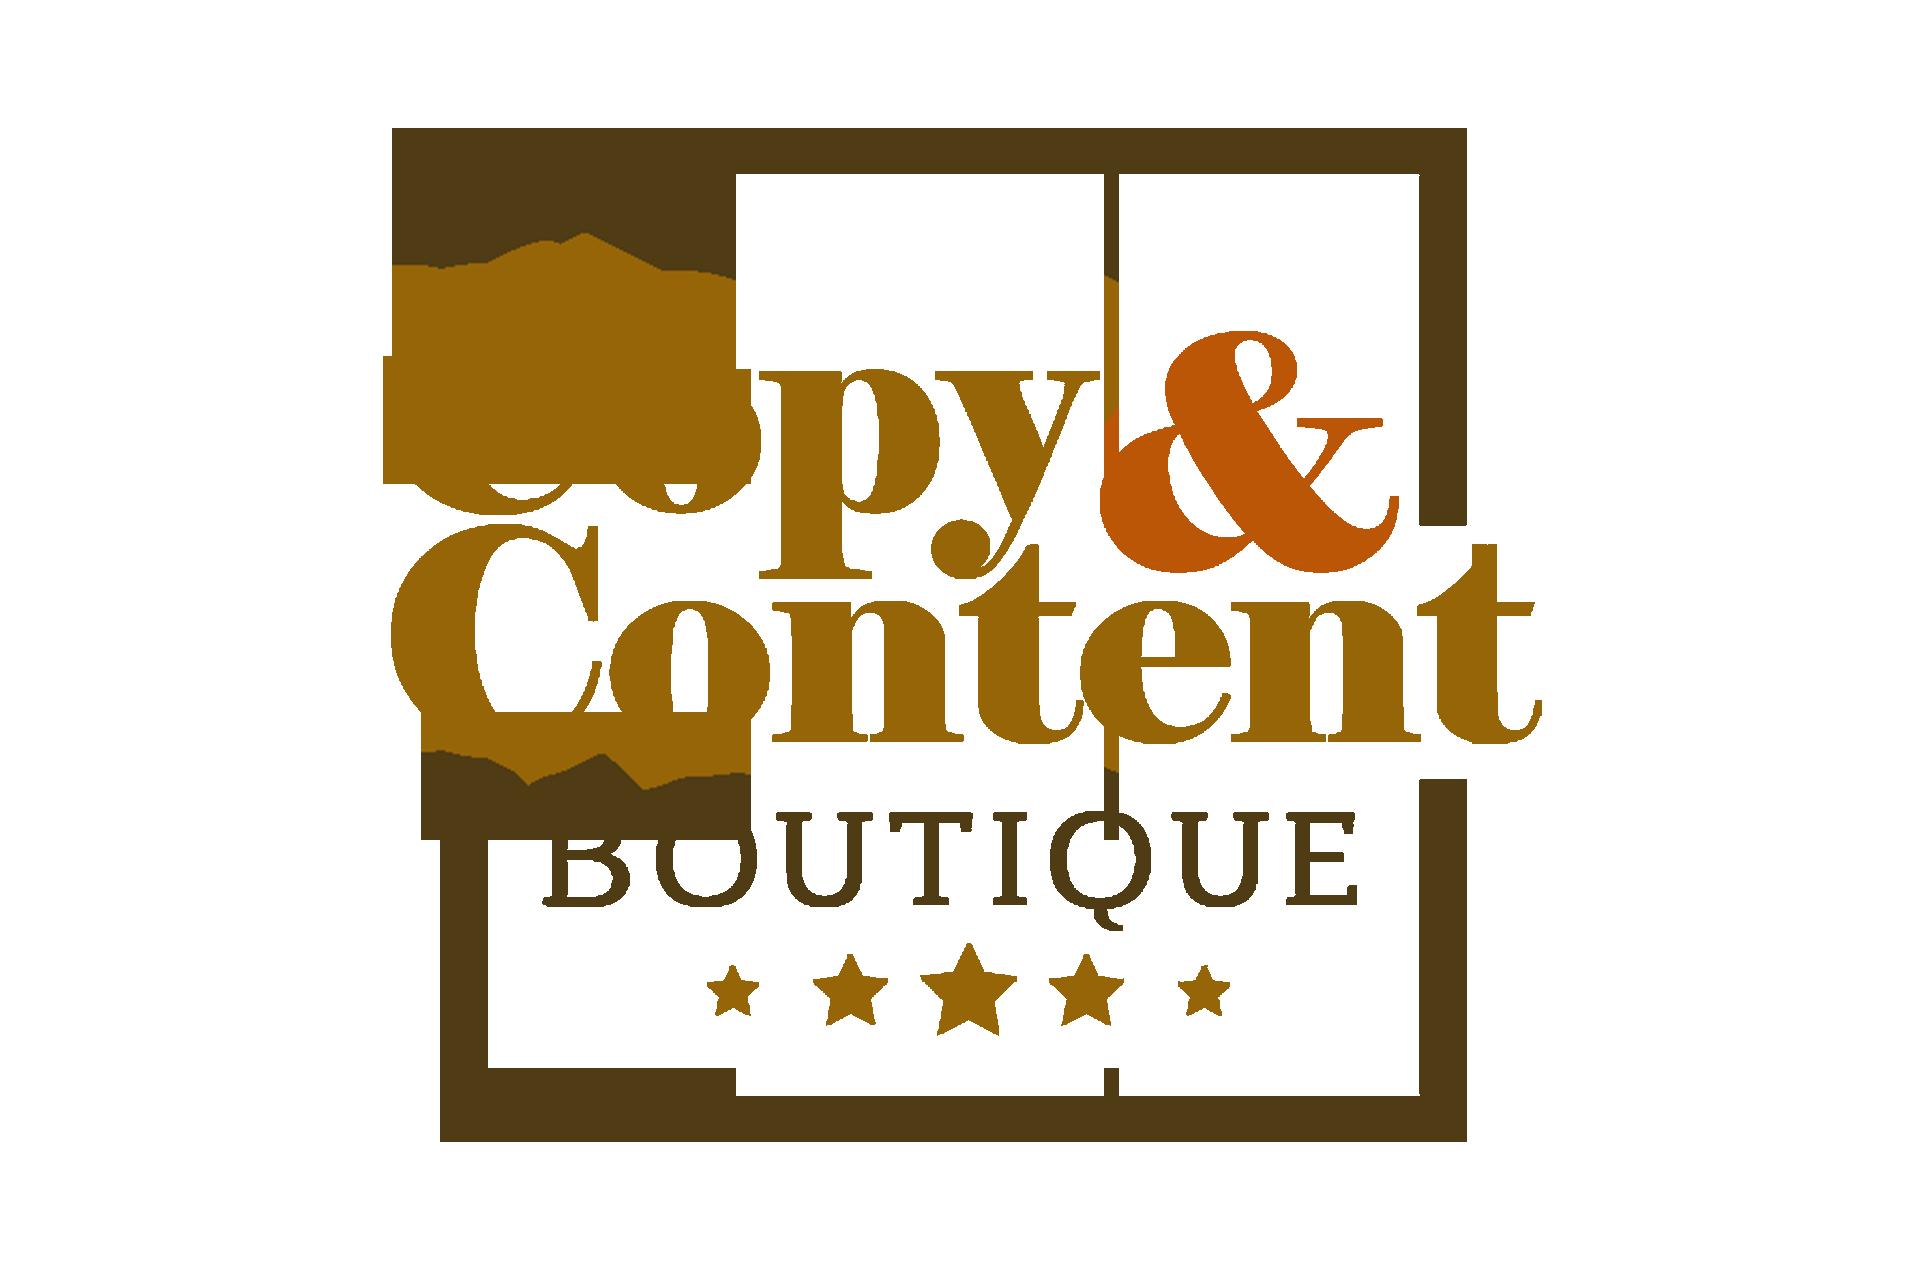 copycontent